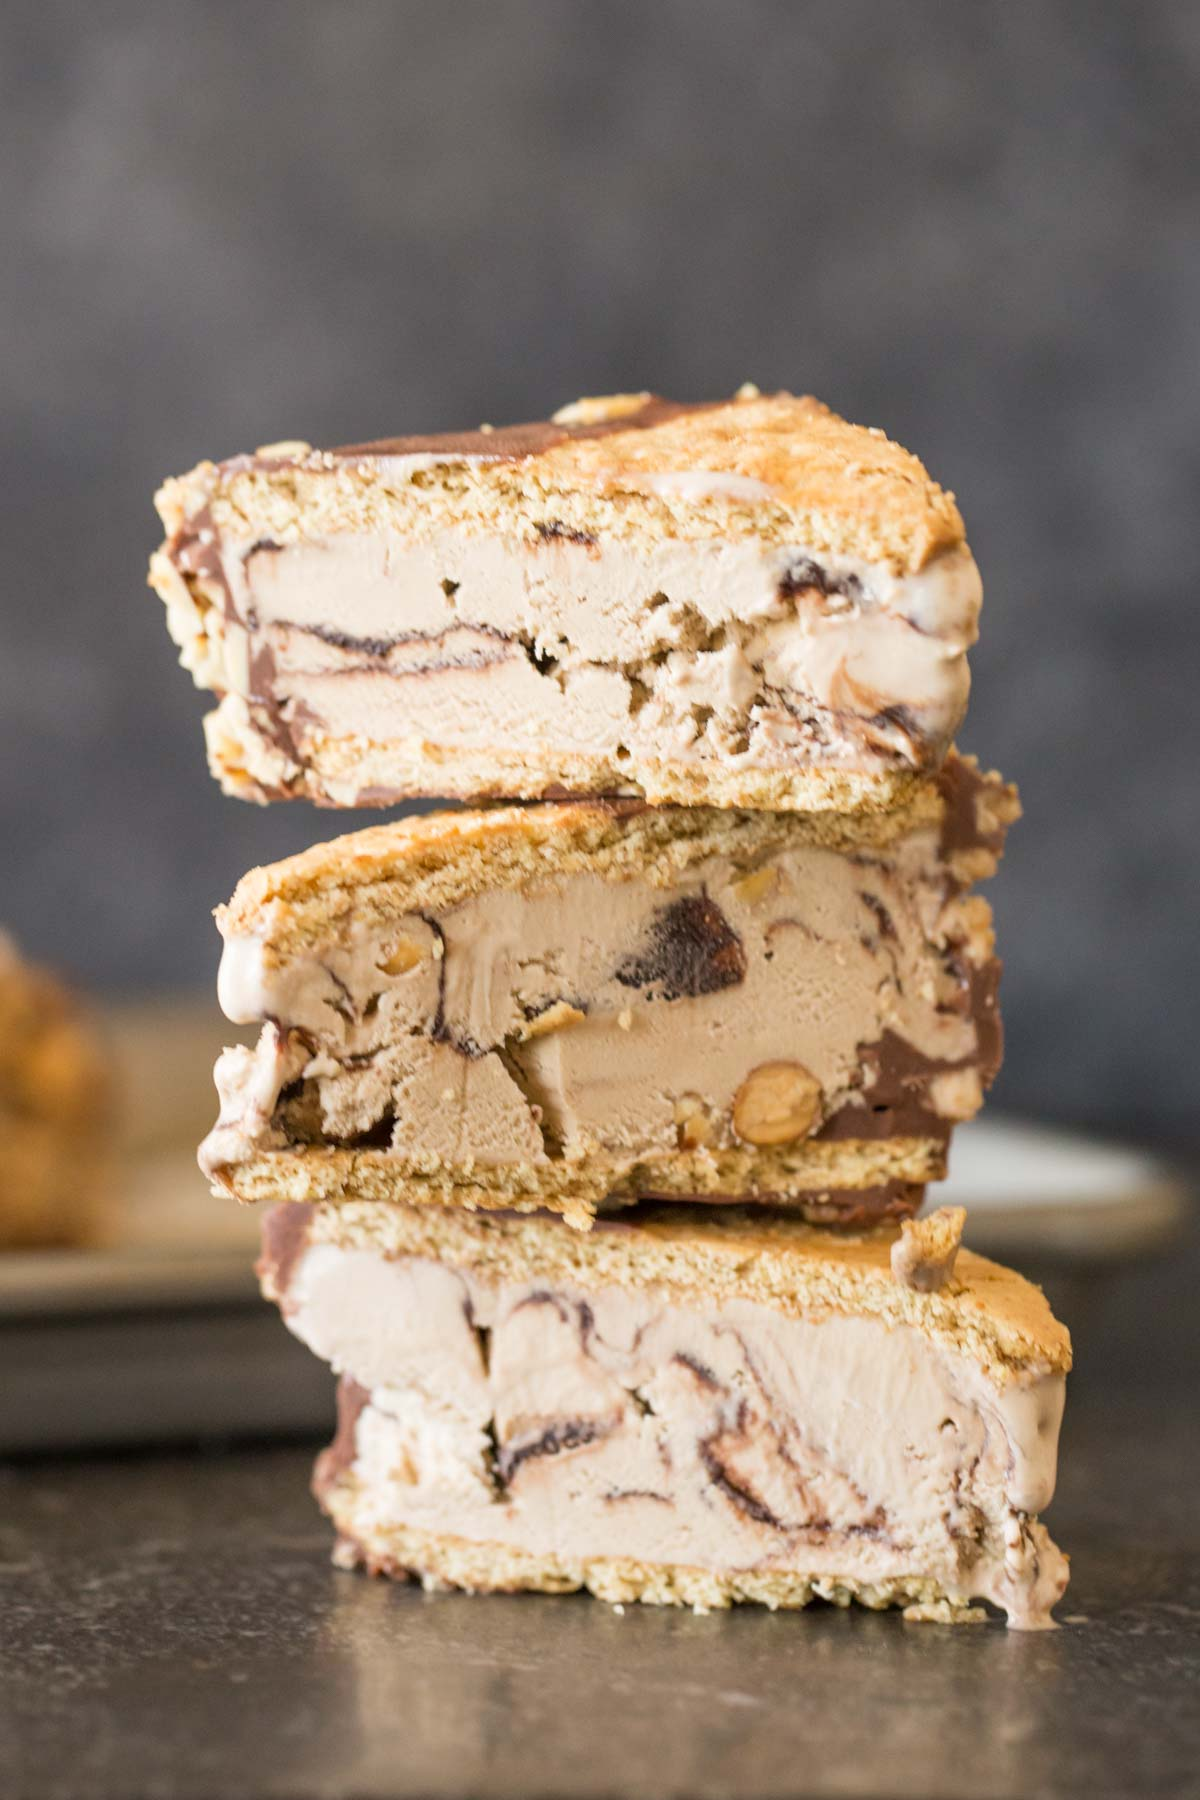 A stack of three Graham Cracker Ice Cream Sandwiches cut in half.